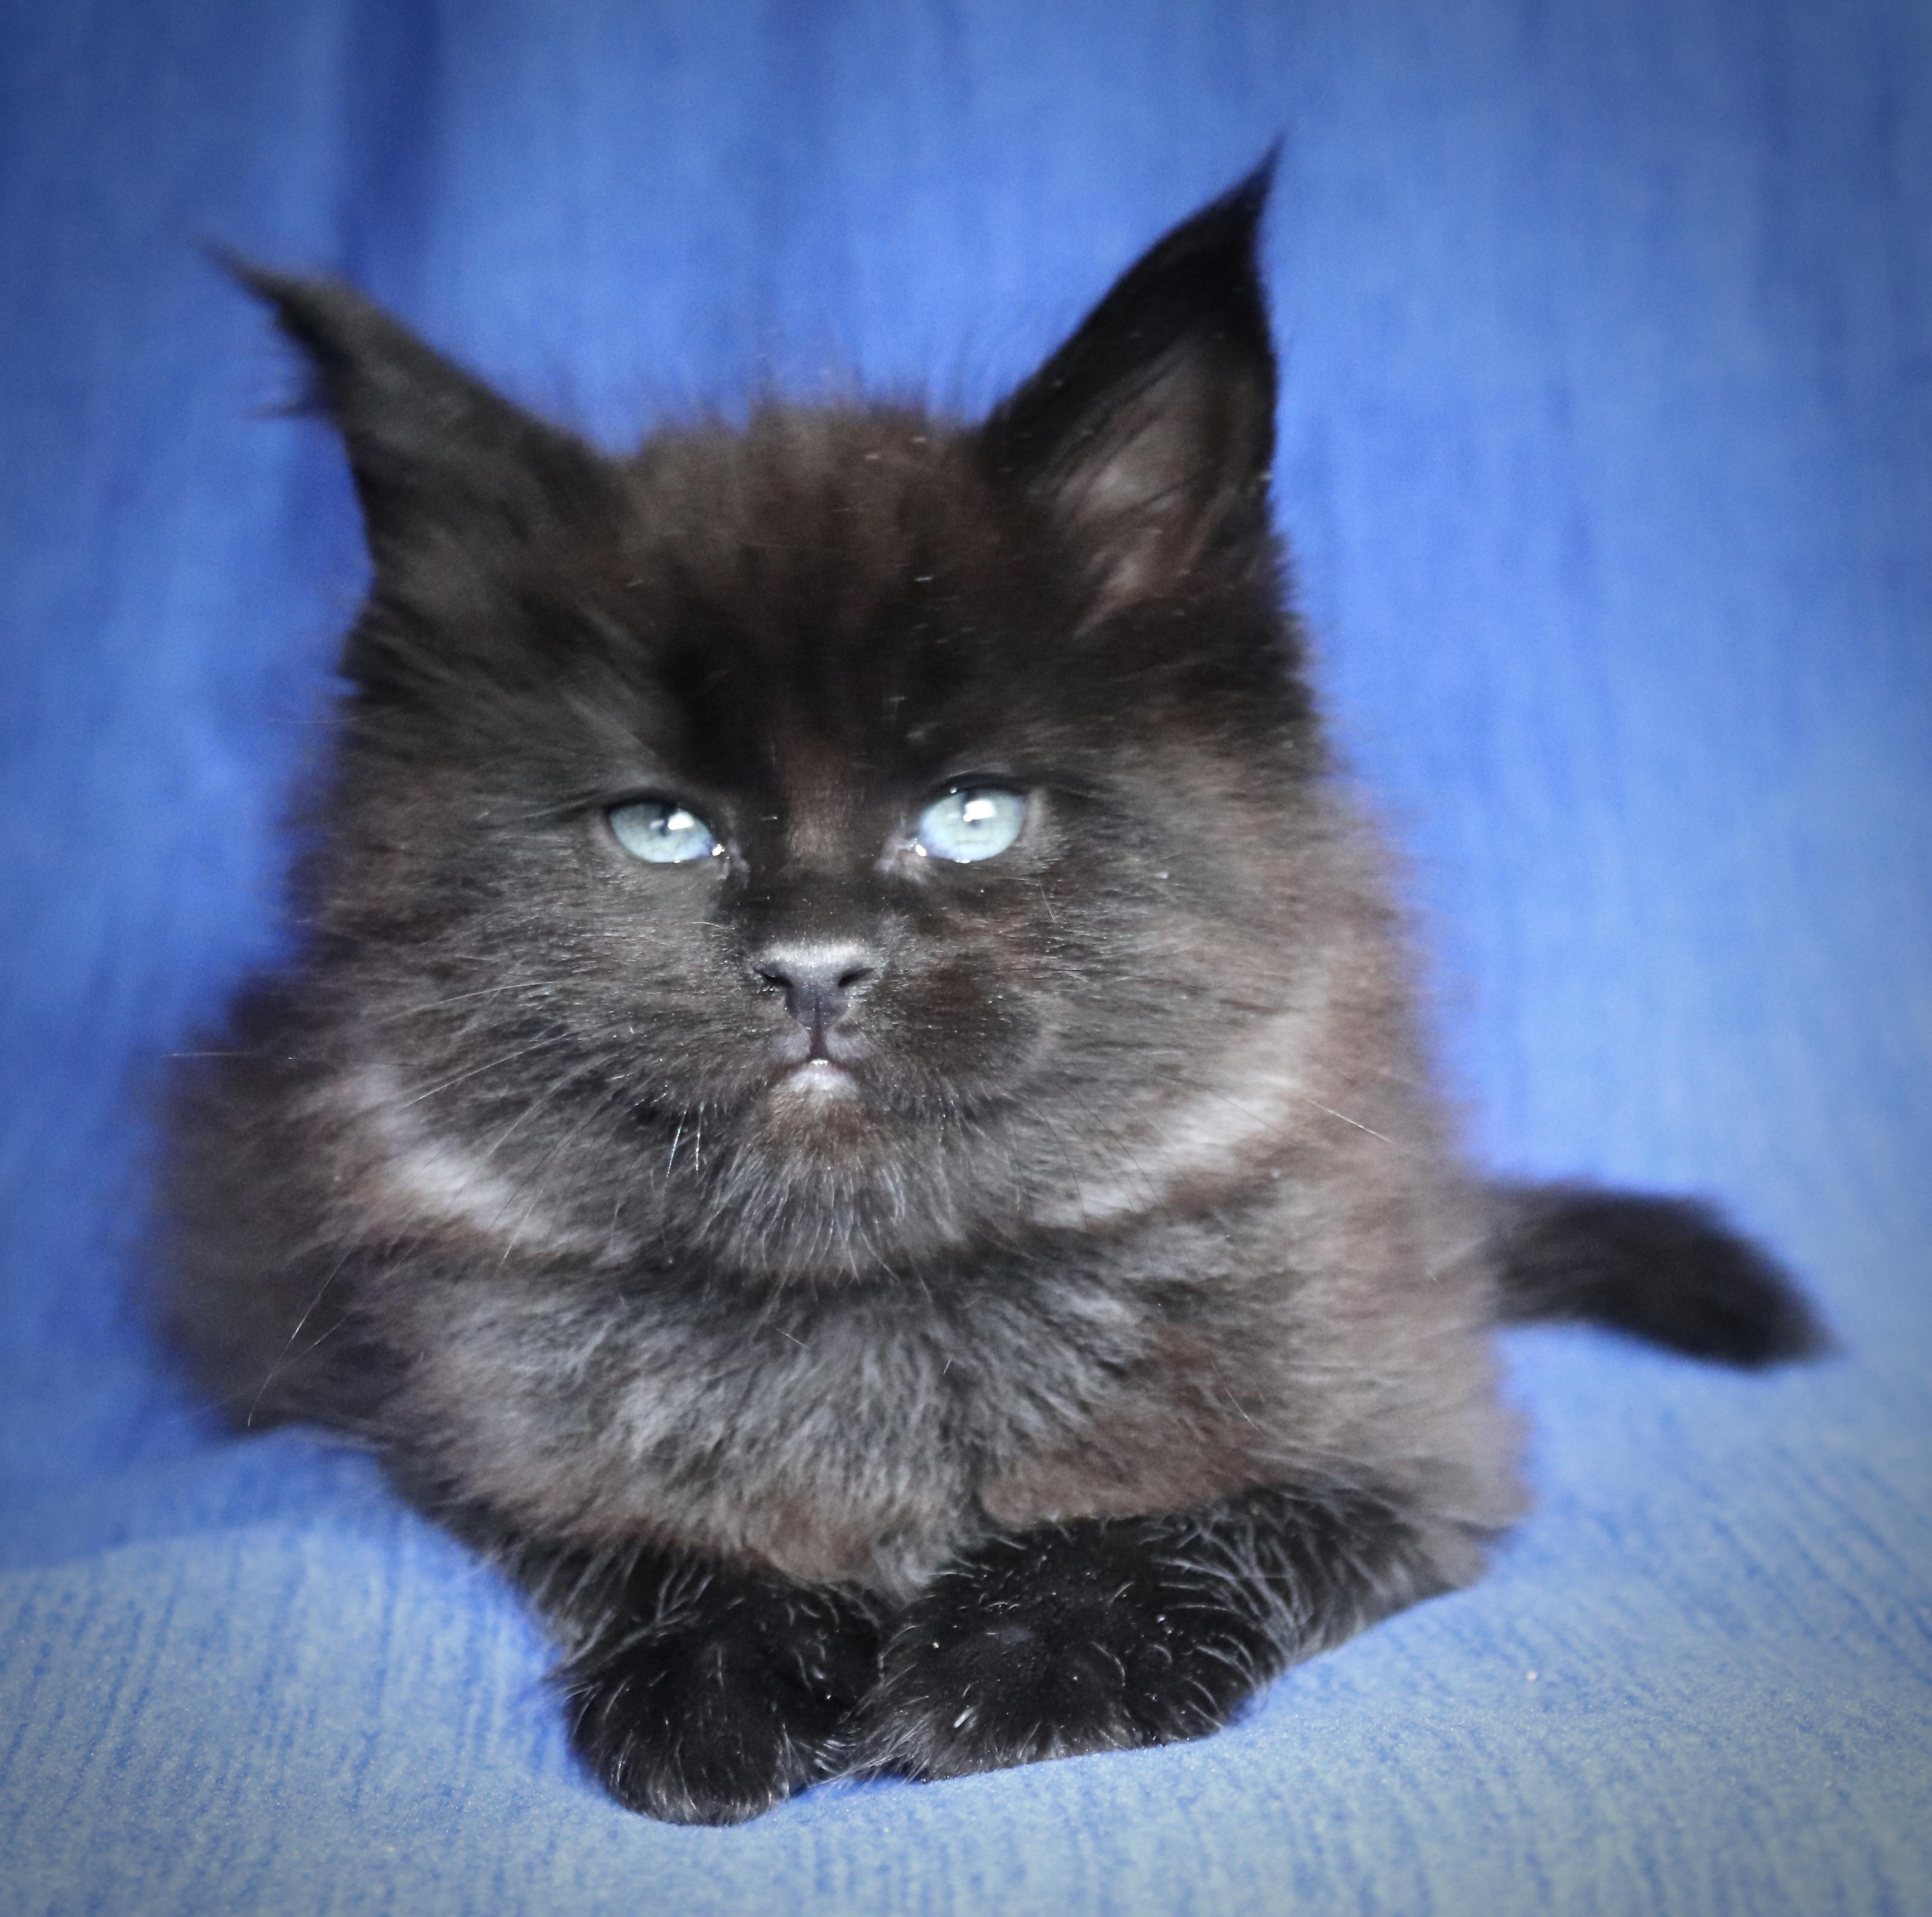 fotka kočky VRH H: HOMBRE von ERILLIAN*CZ 👦🏻